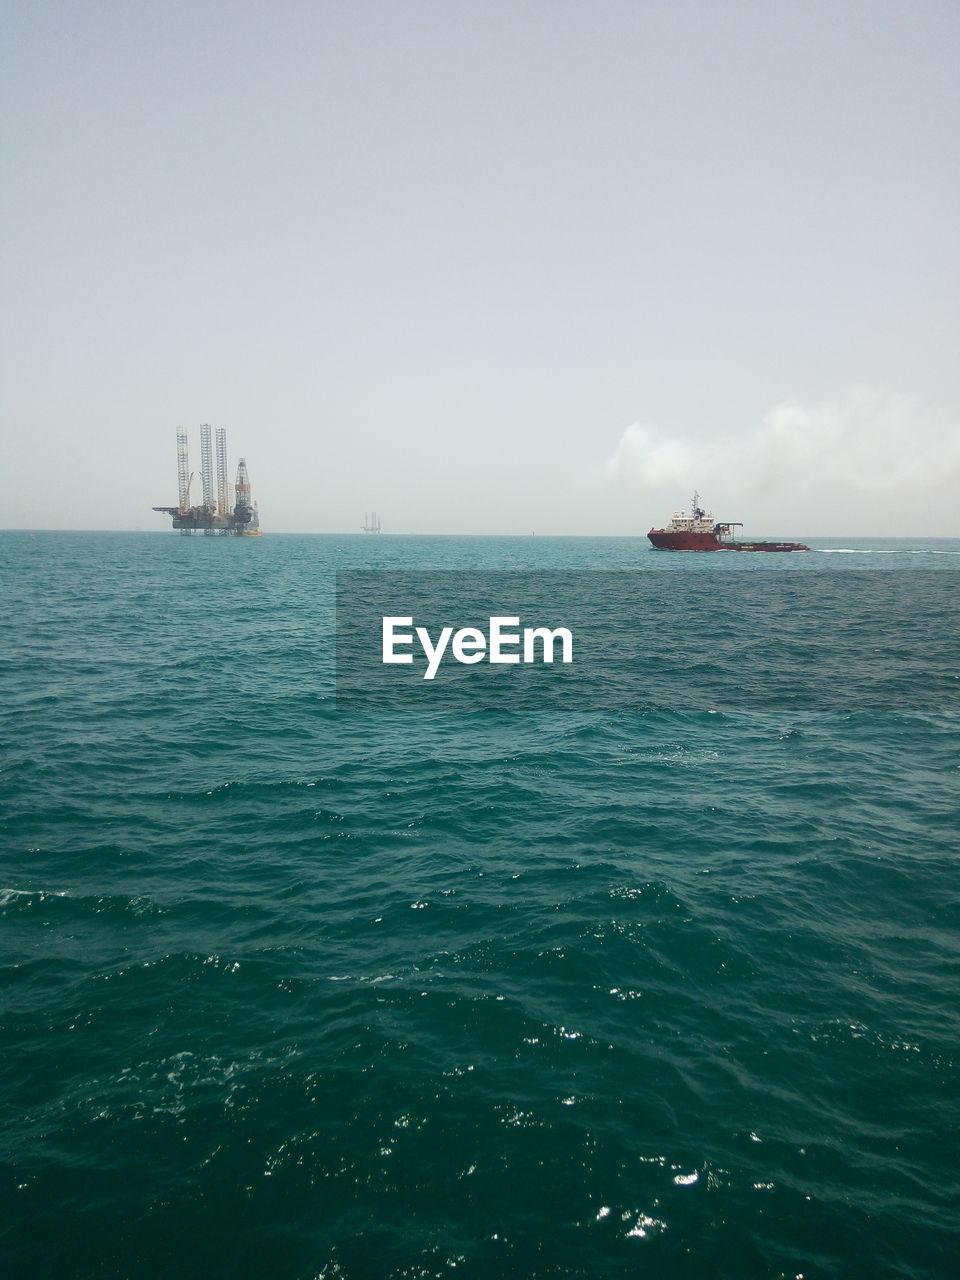 SHIP SAILING ON SEA AGAINST CLEAR SKY